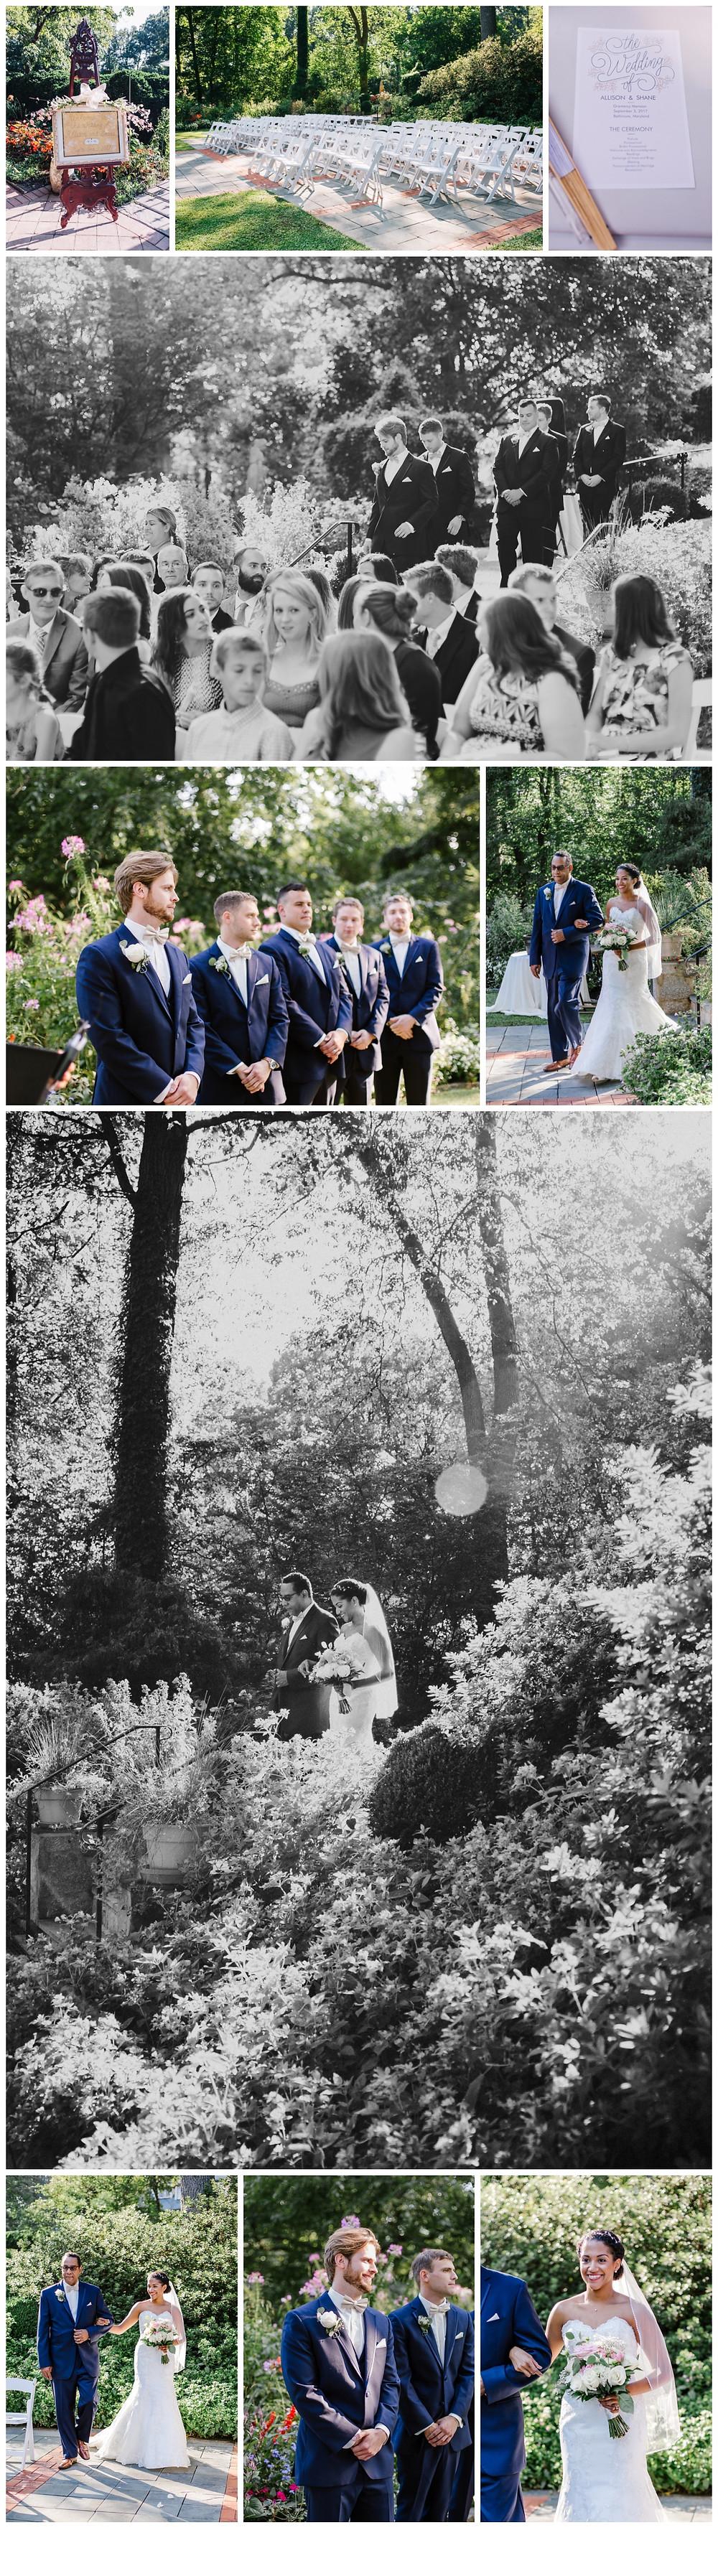 Garden wedding at Maryland wedding venue Gramercy Mansion